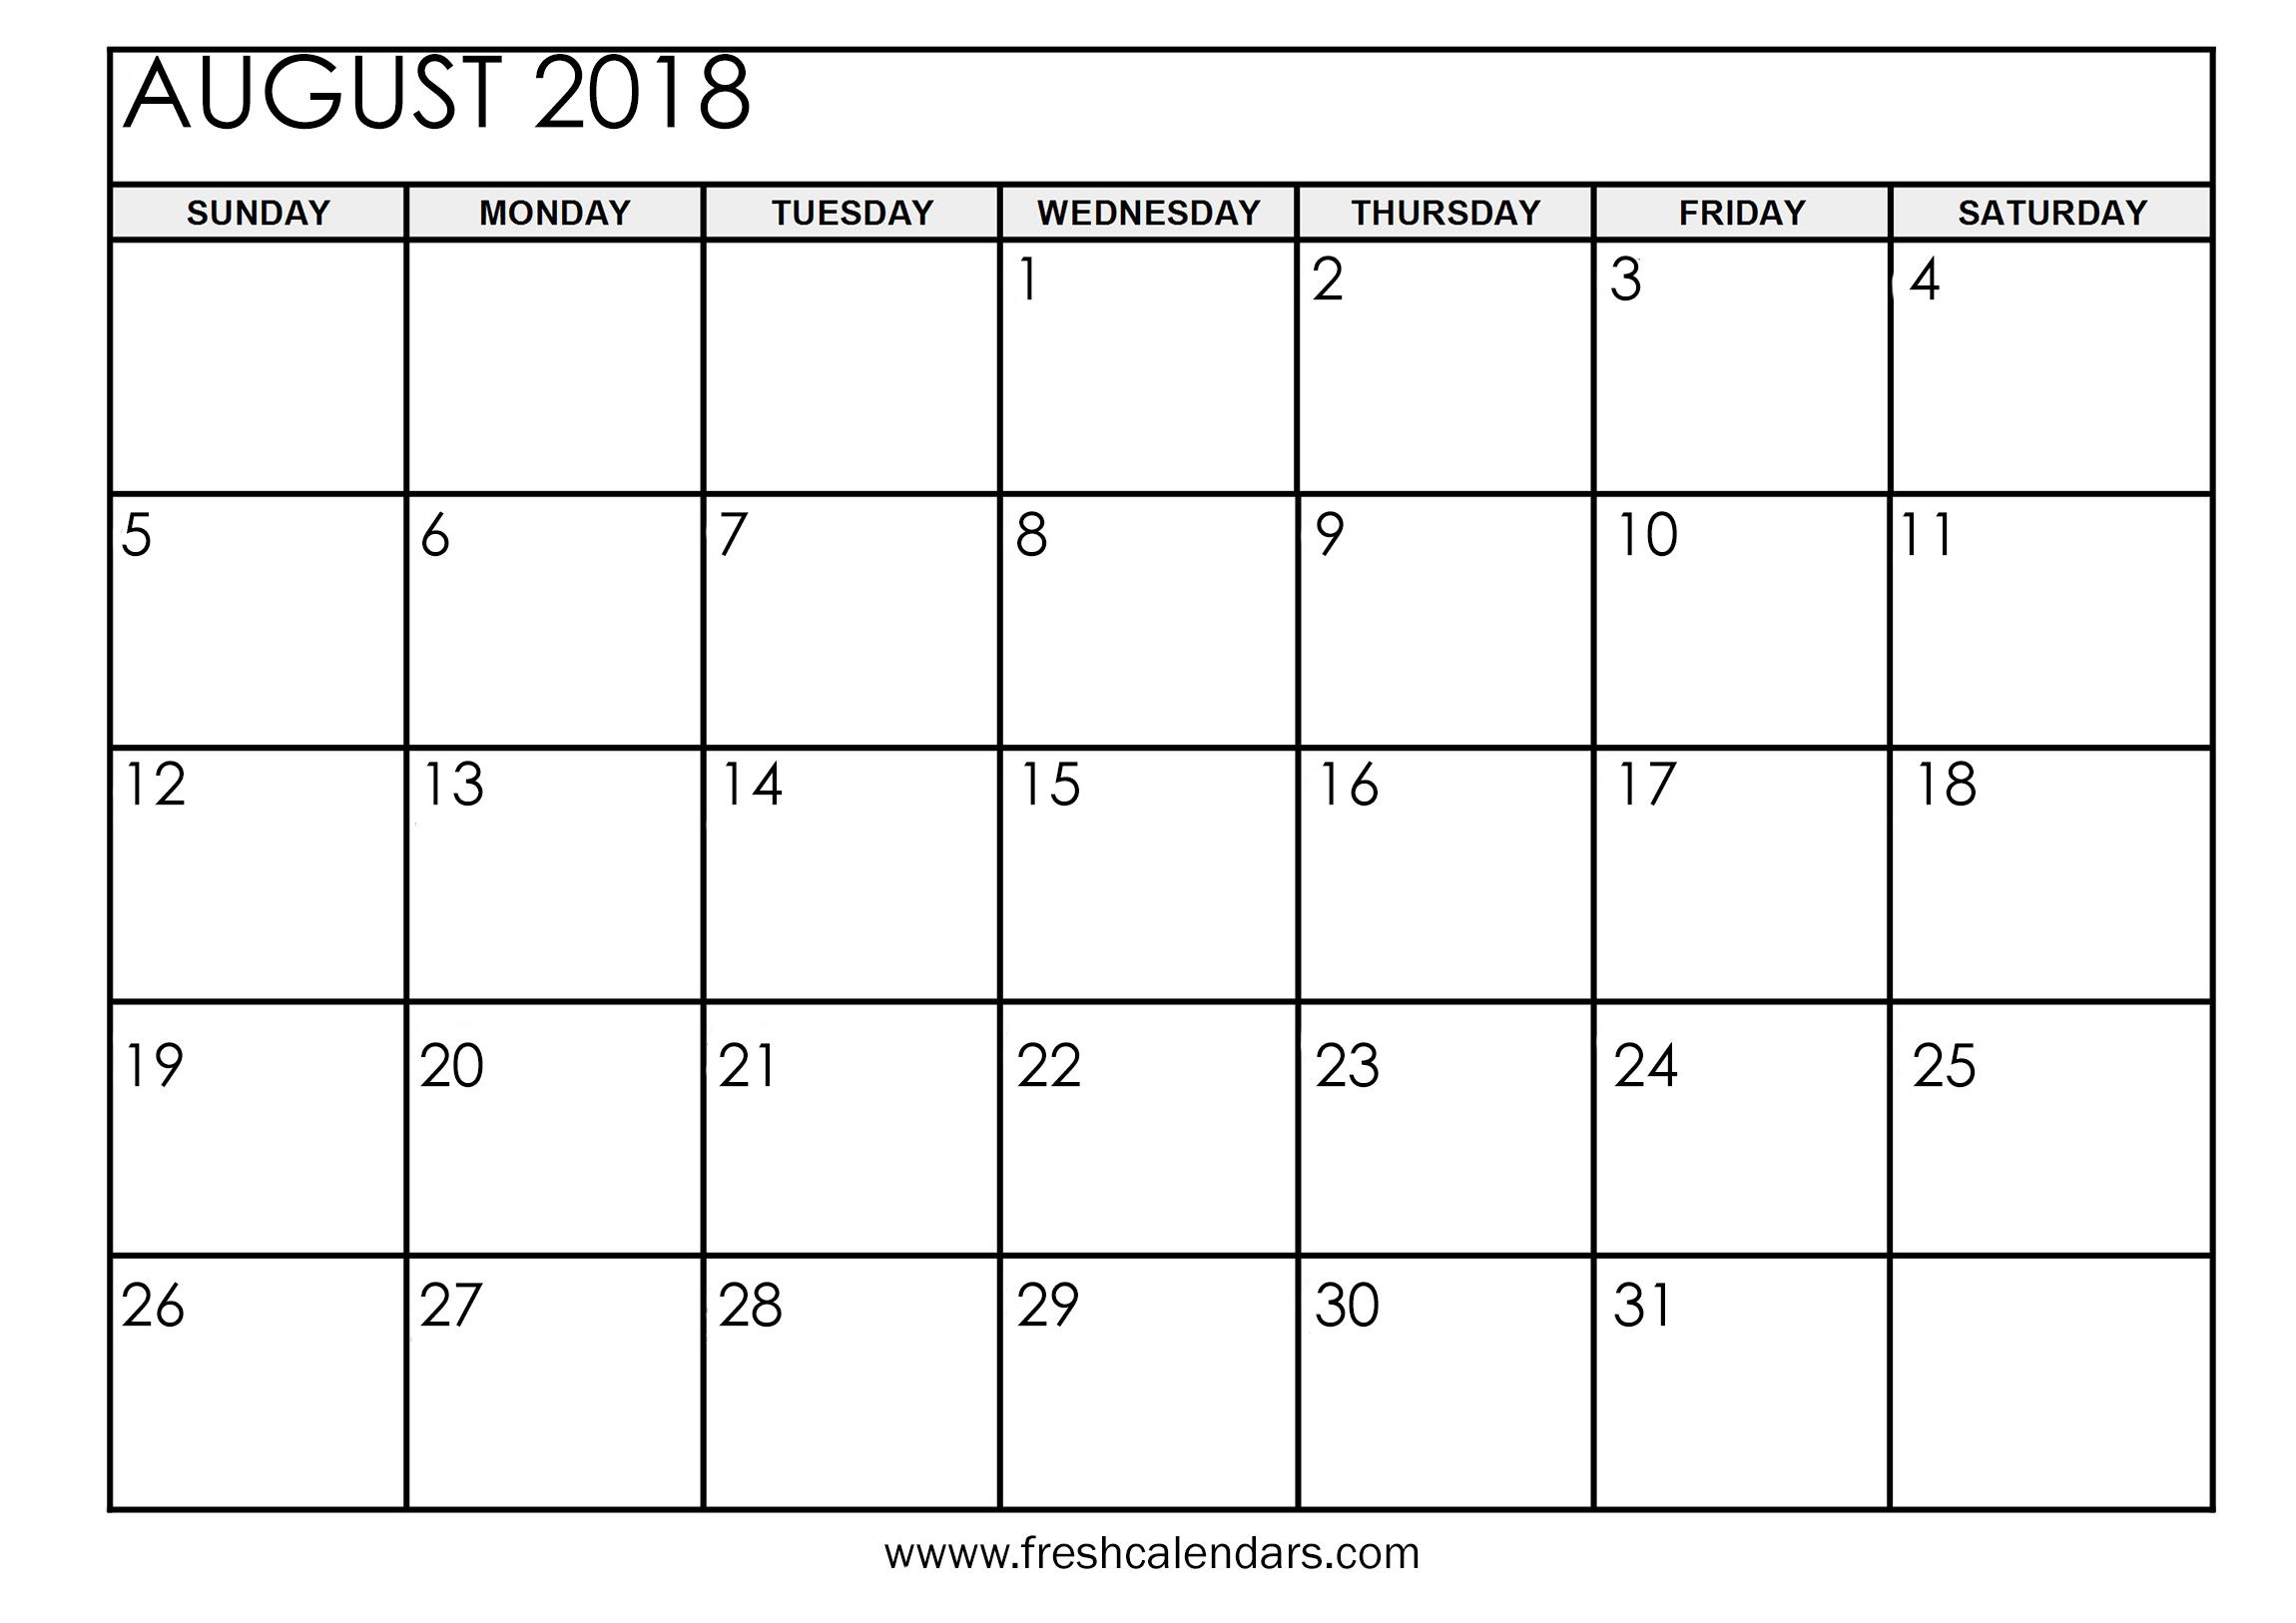 August 2018 Calendar Printable - Fresh Calendars with August Blank Calendar Monday Through Friday